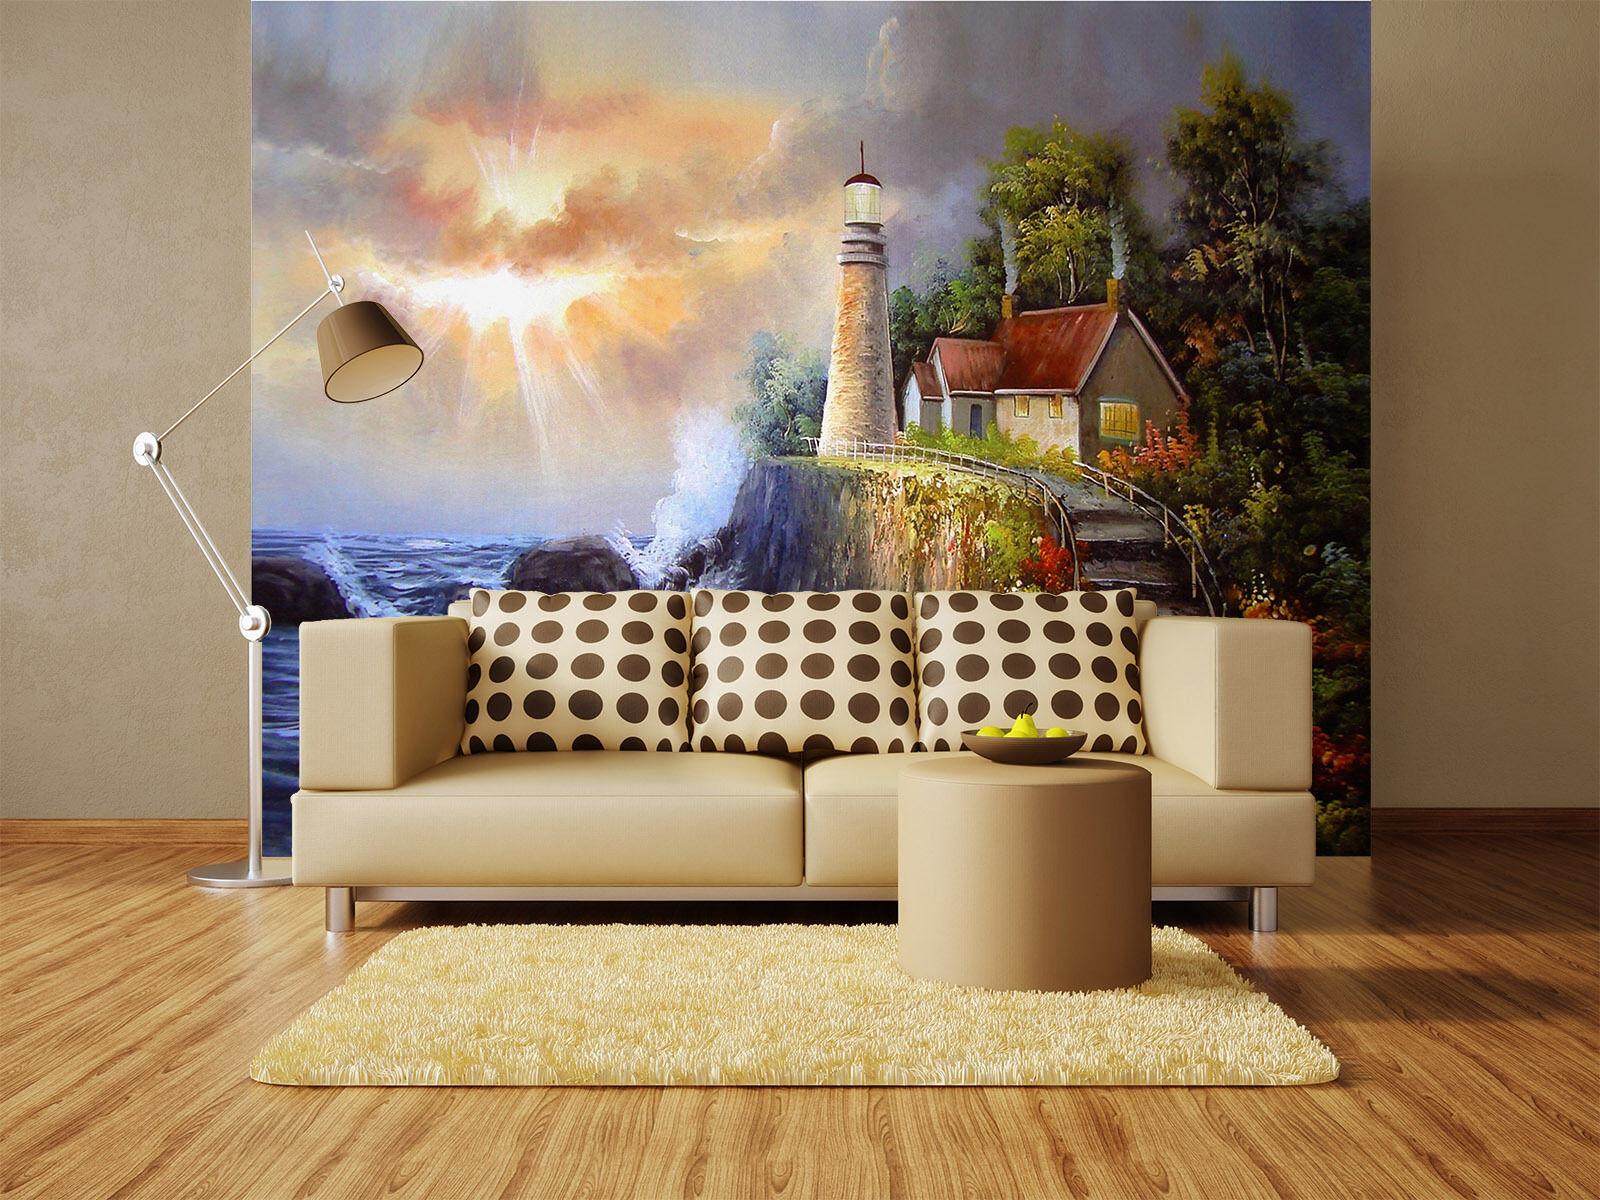 3D Haus am Strand in Sonne 86 Fototapeten Wandbild Fototapete BildTapete Familie